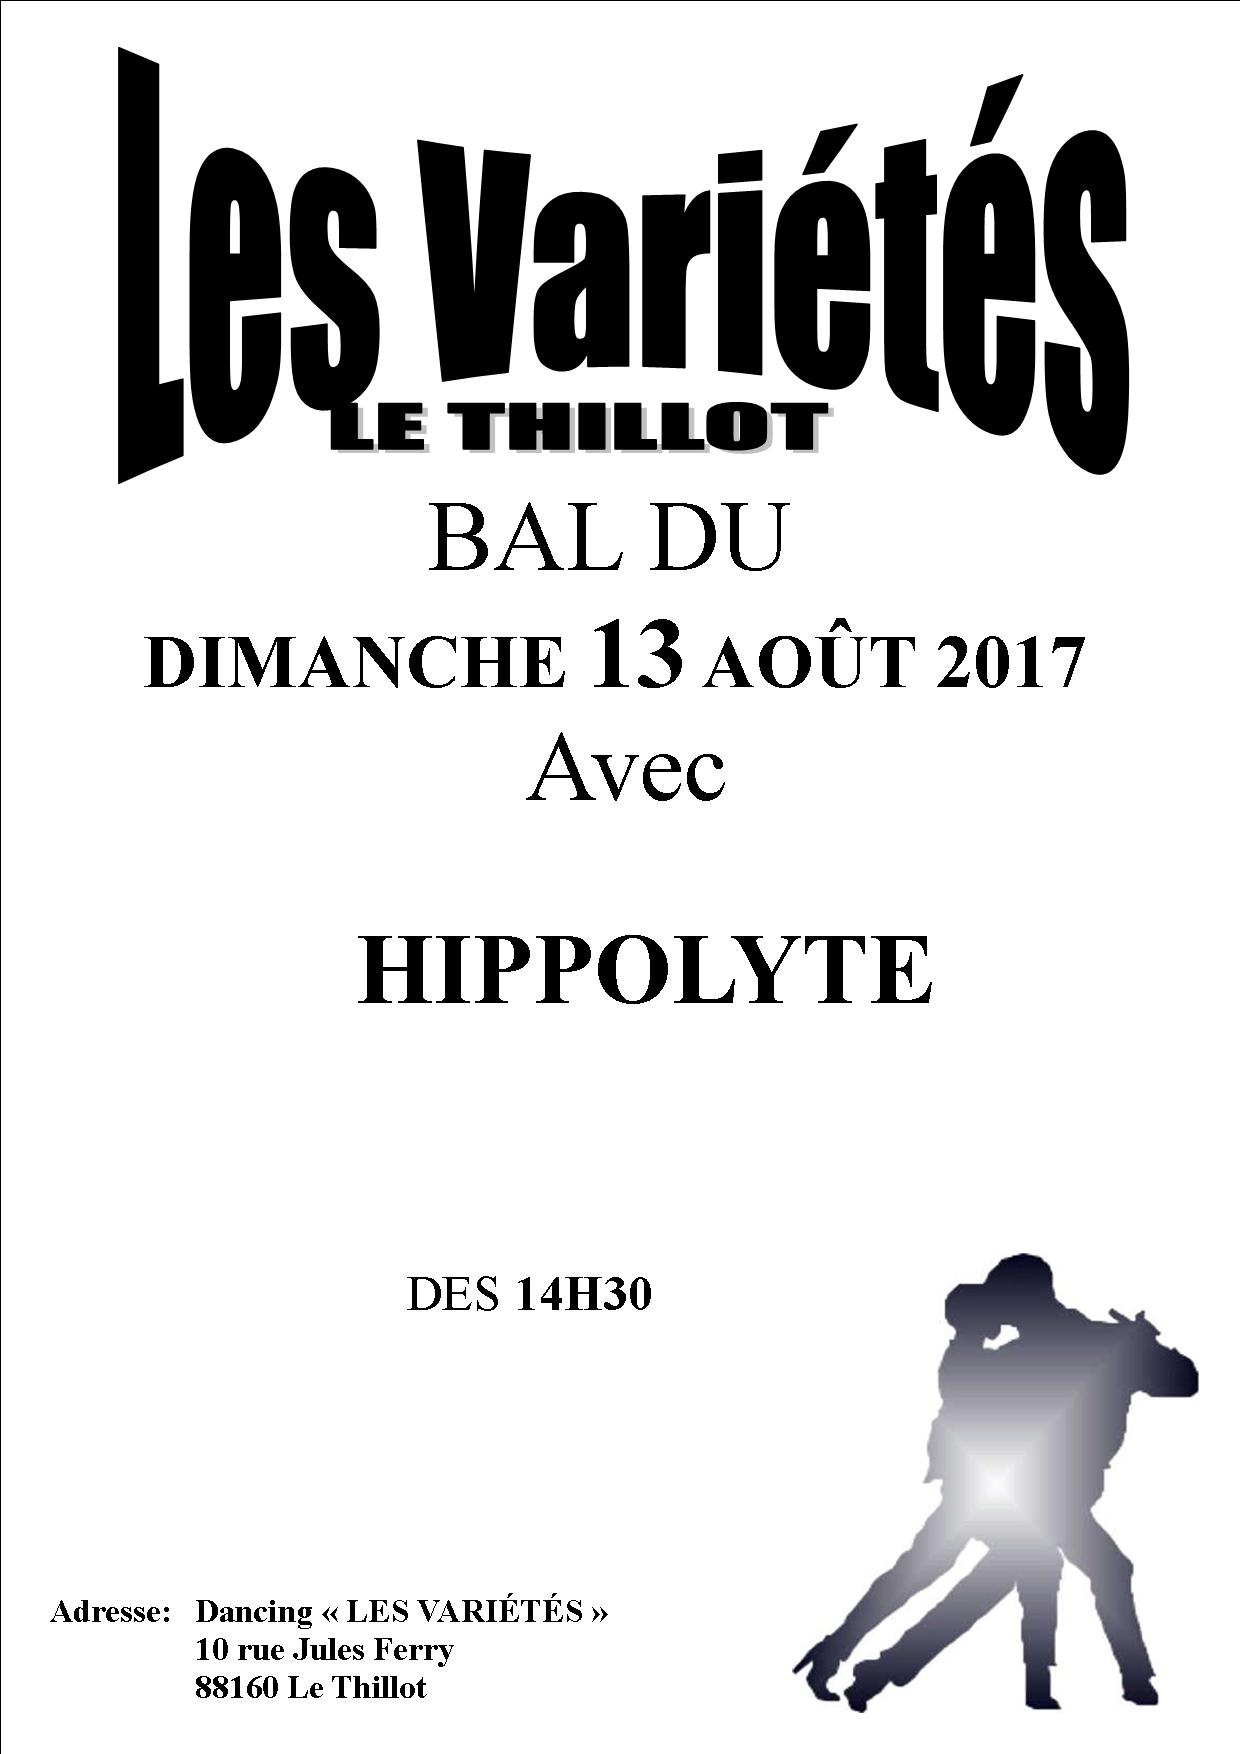 HIPPOLYTE 13 AOUT 2017